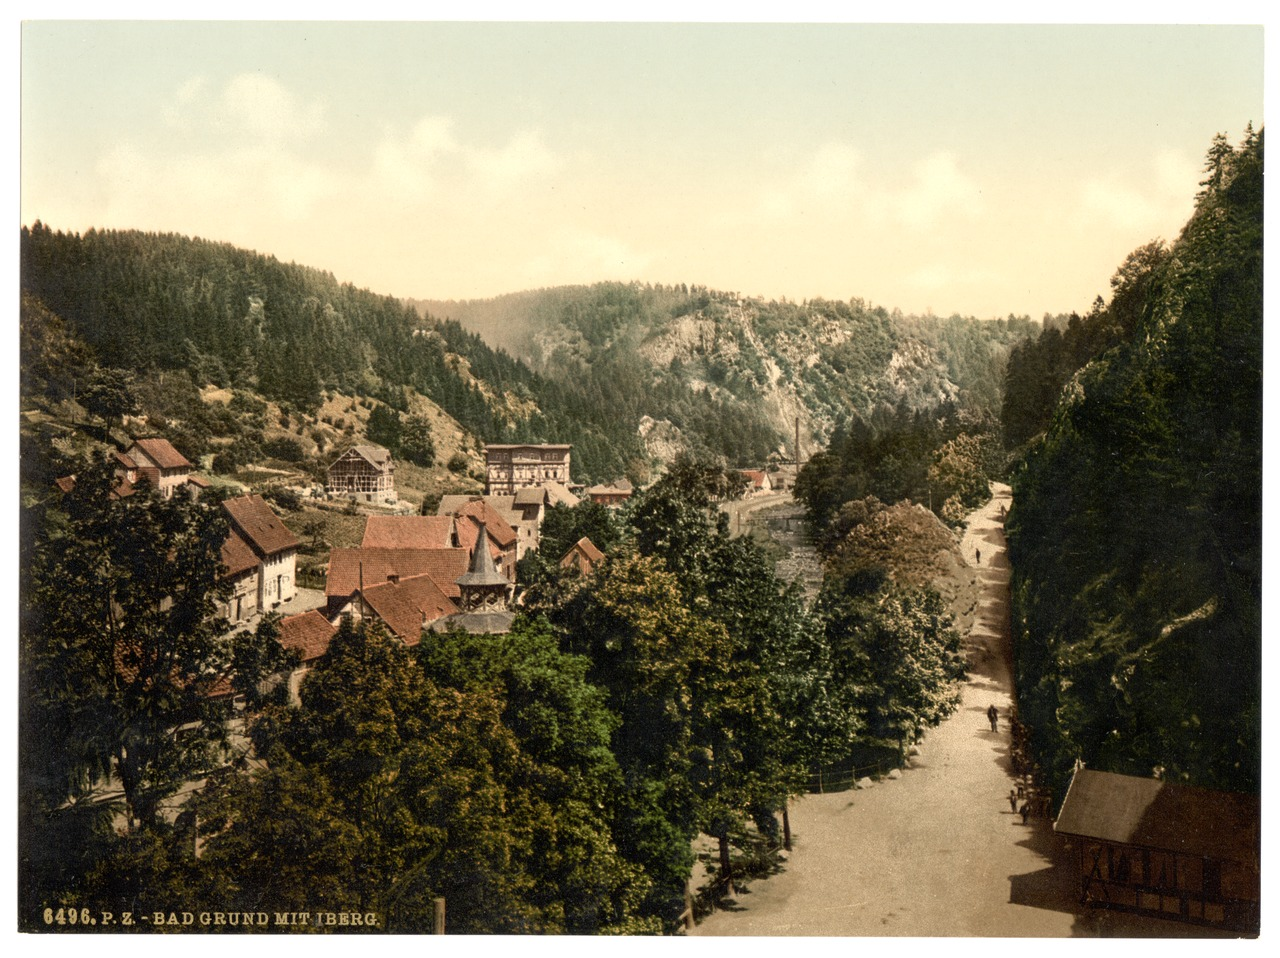 Bath Grund i.e., Bad Grund with Iberg, Hartz, Germany ...